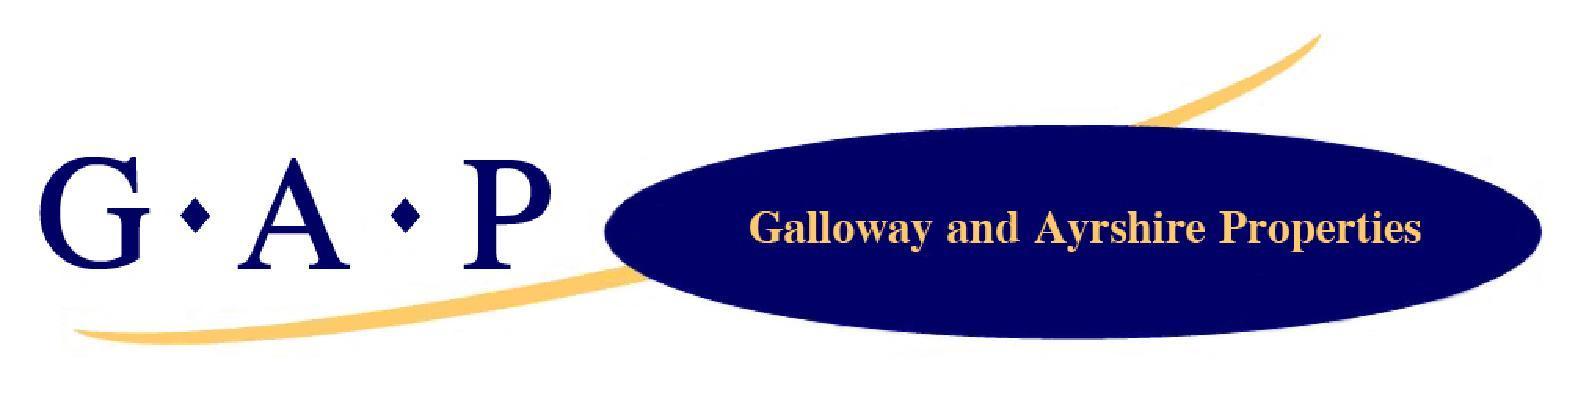 Galloway & Ayrshire Properties